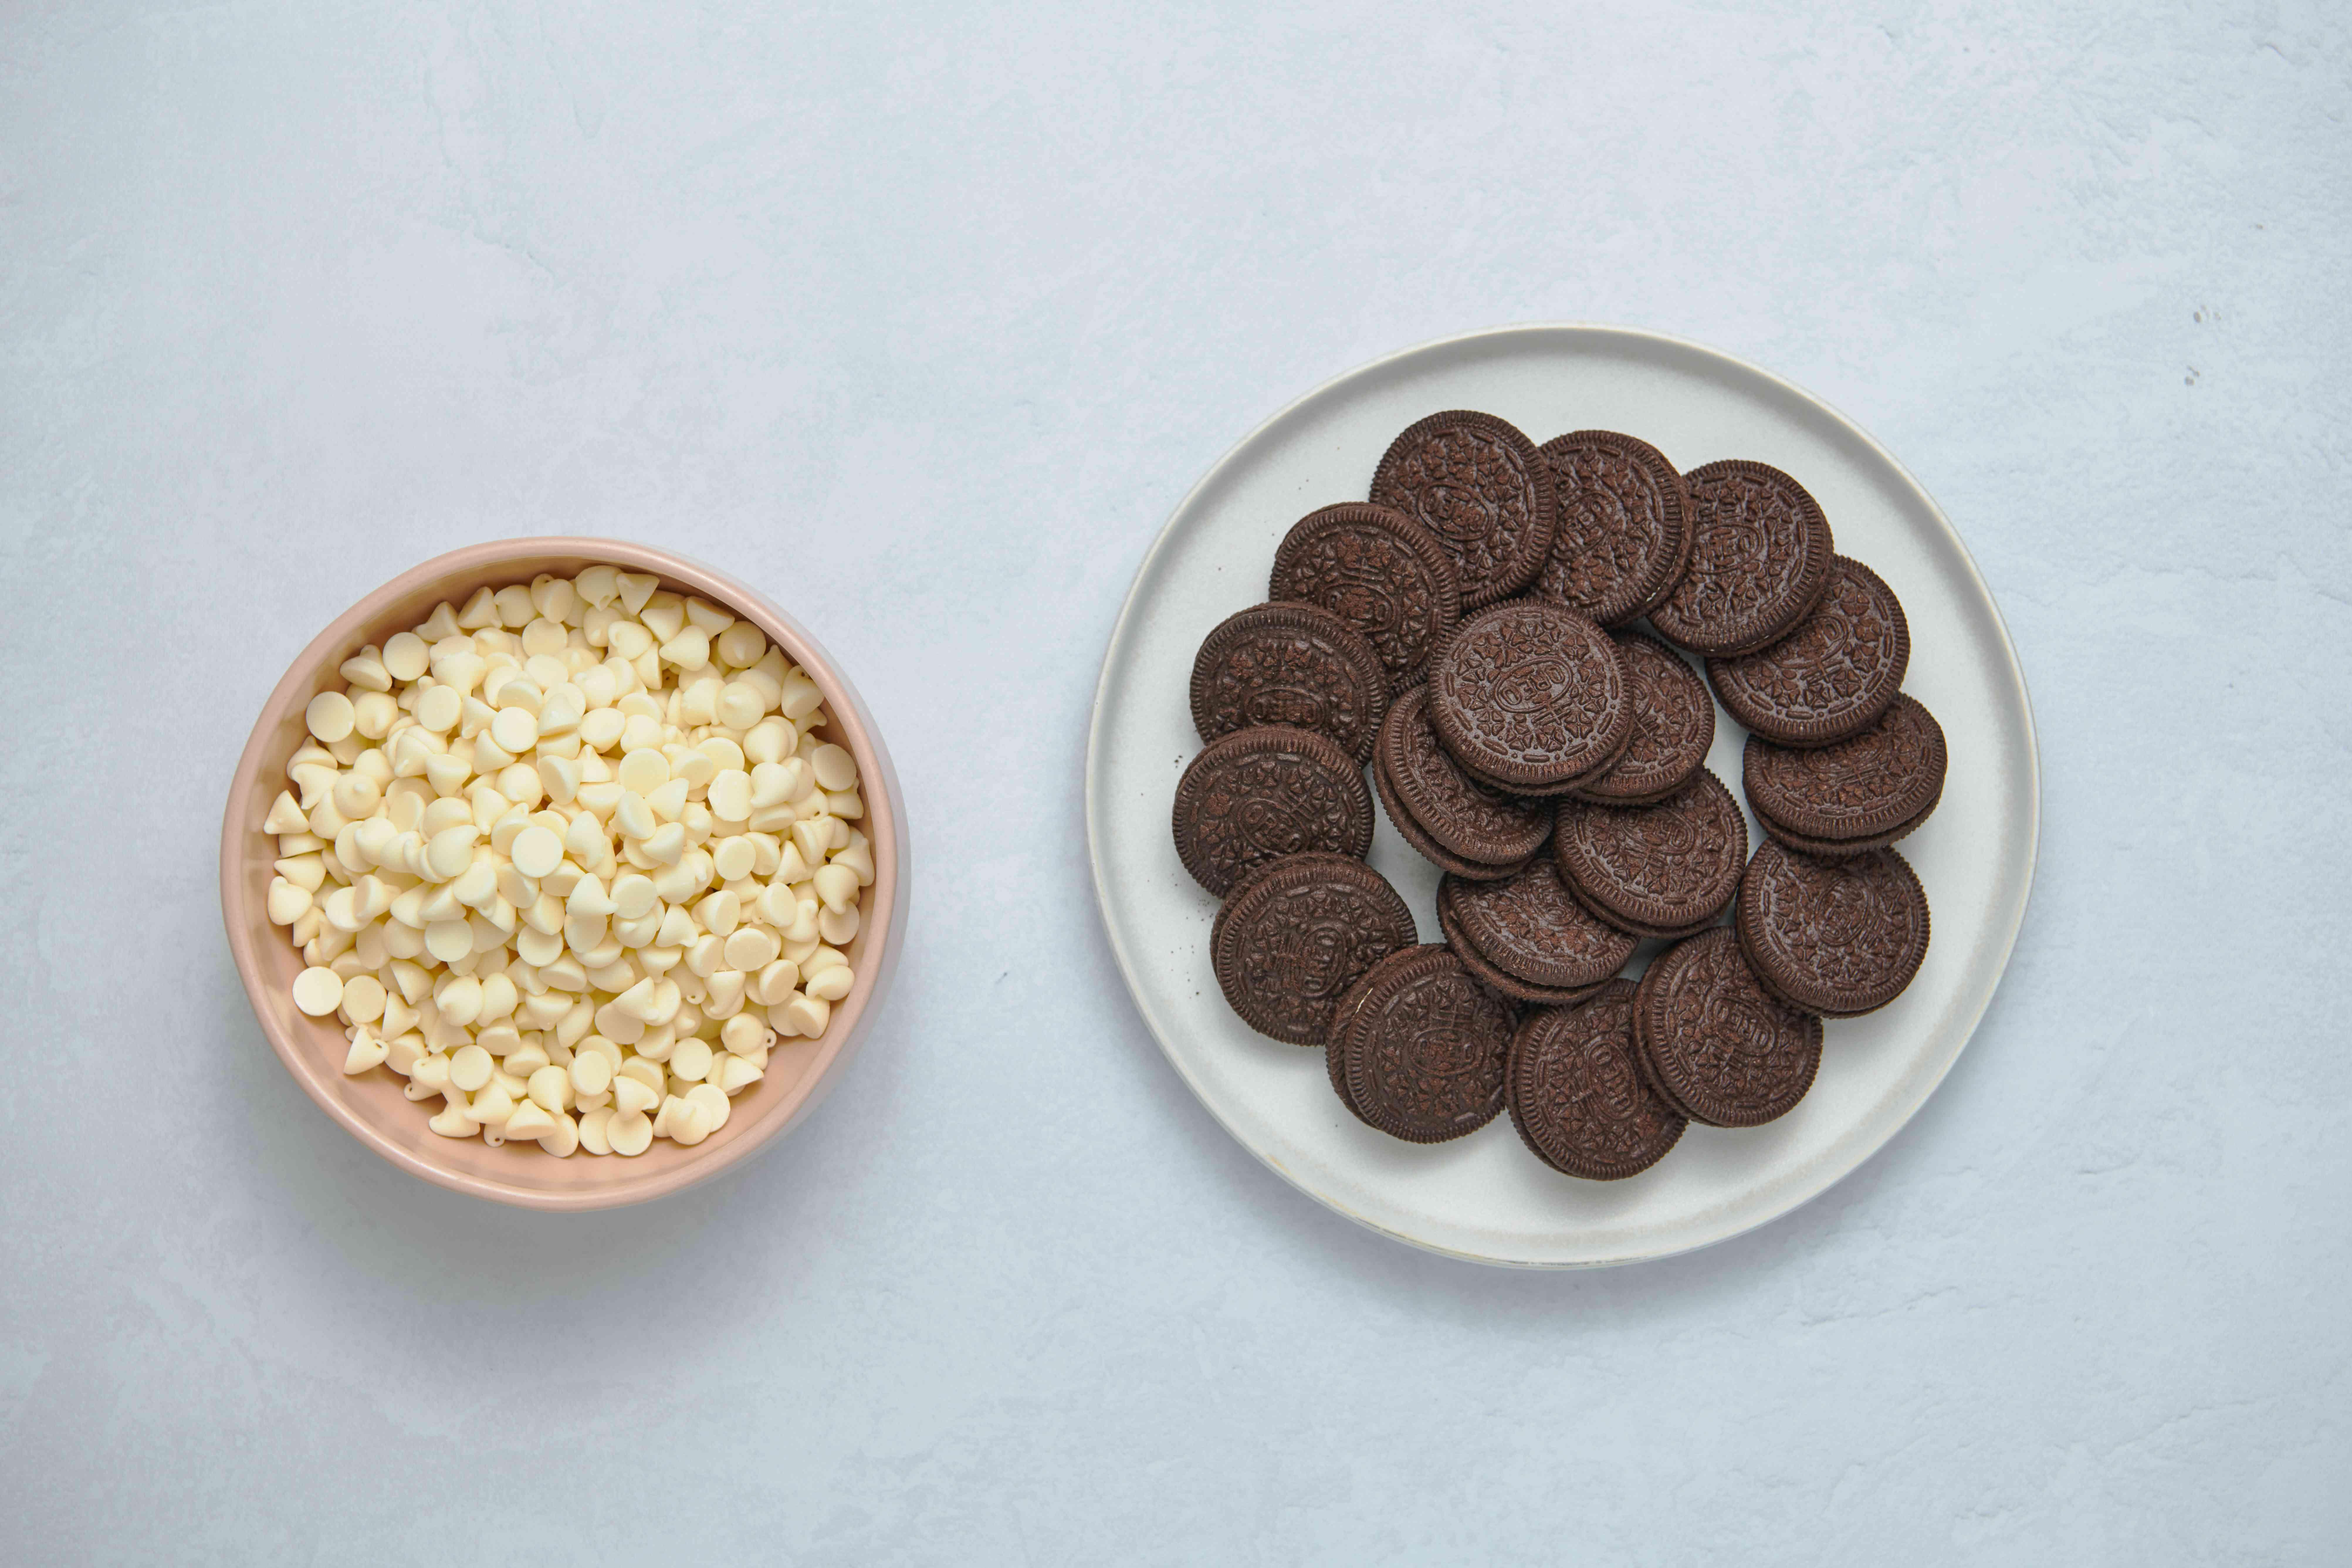 Cookies-and-Cream Bark ingredients